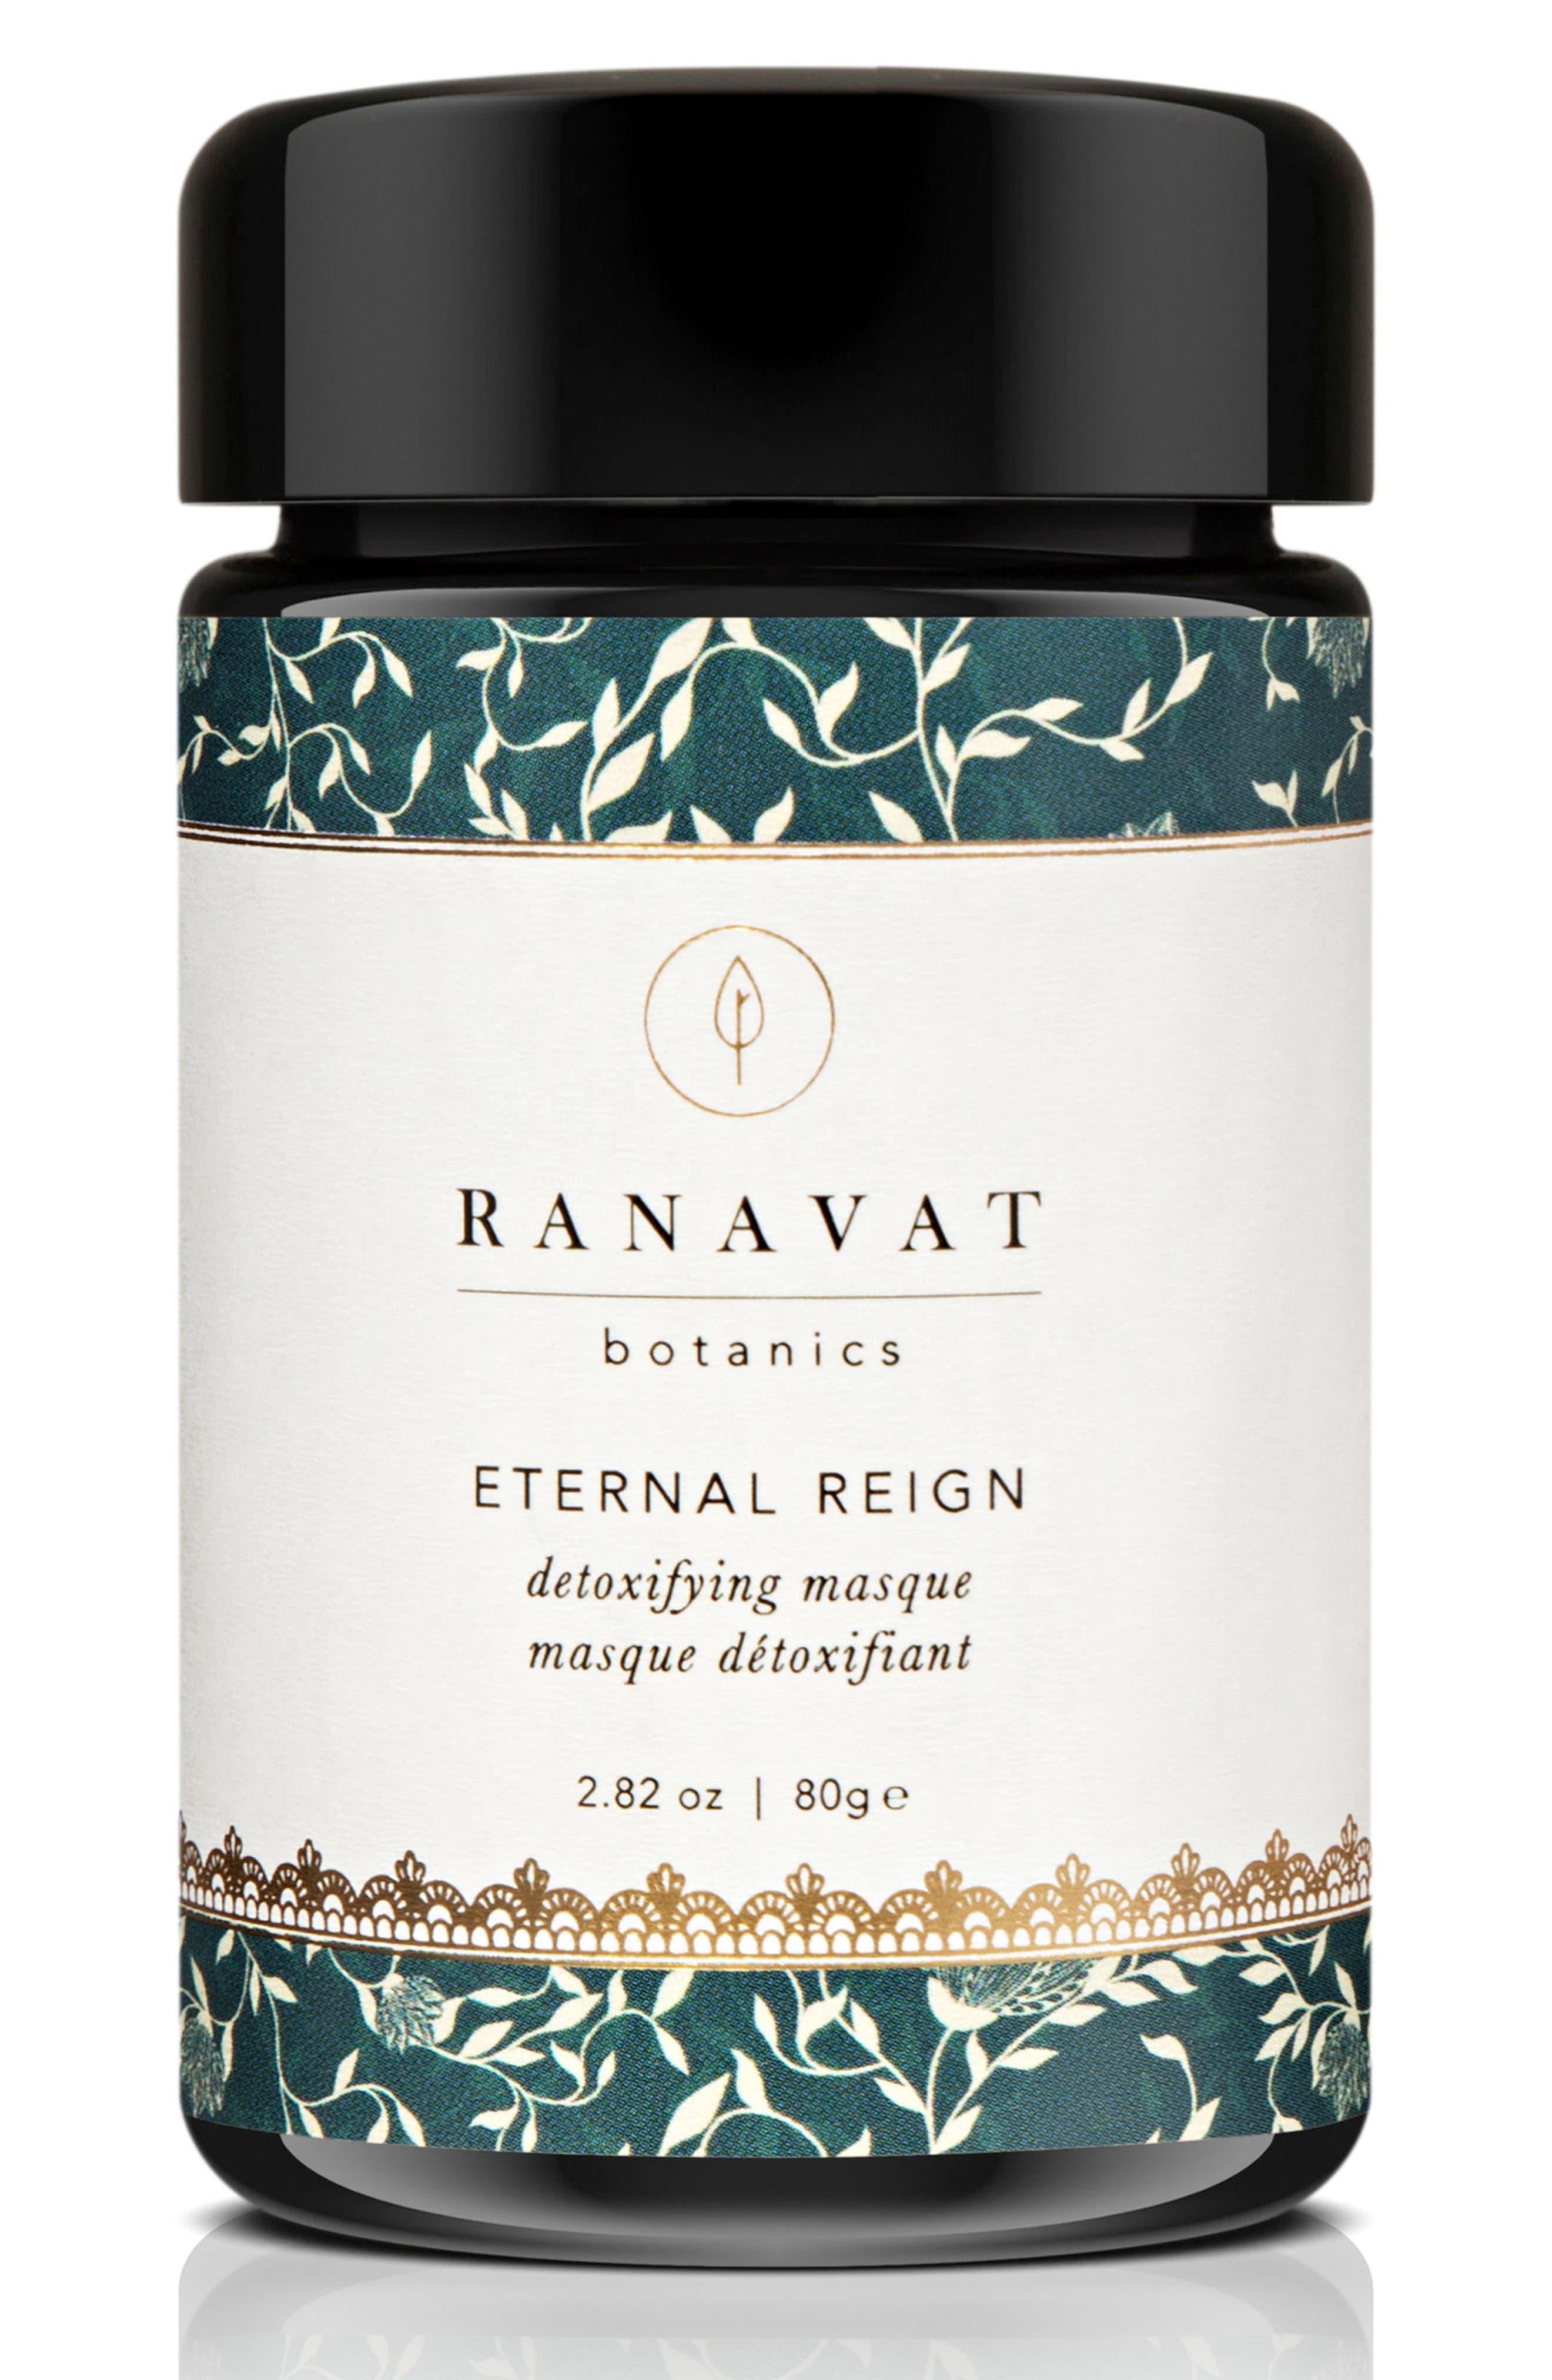 Alternate Image 1 Selected - Ranavat Botanics Eternal Reign Detoxifying Masque